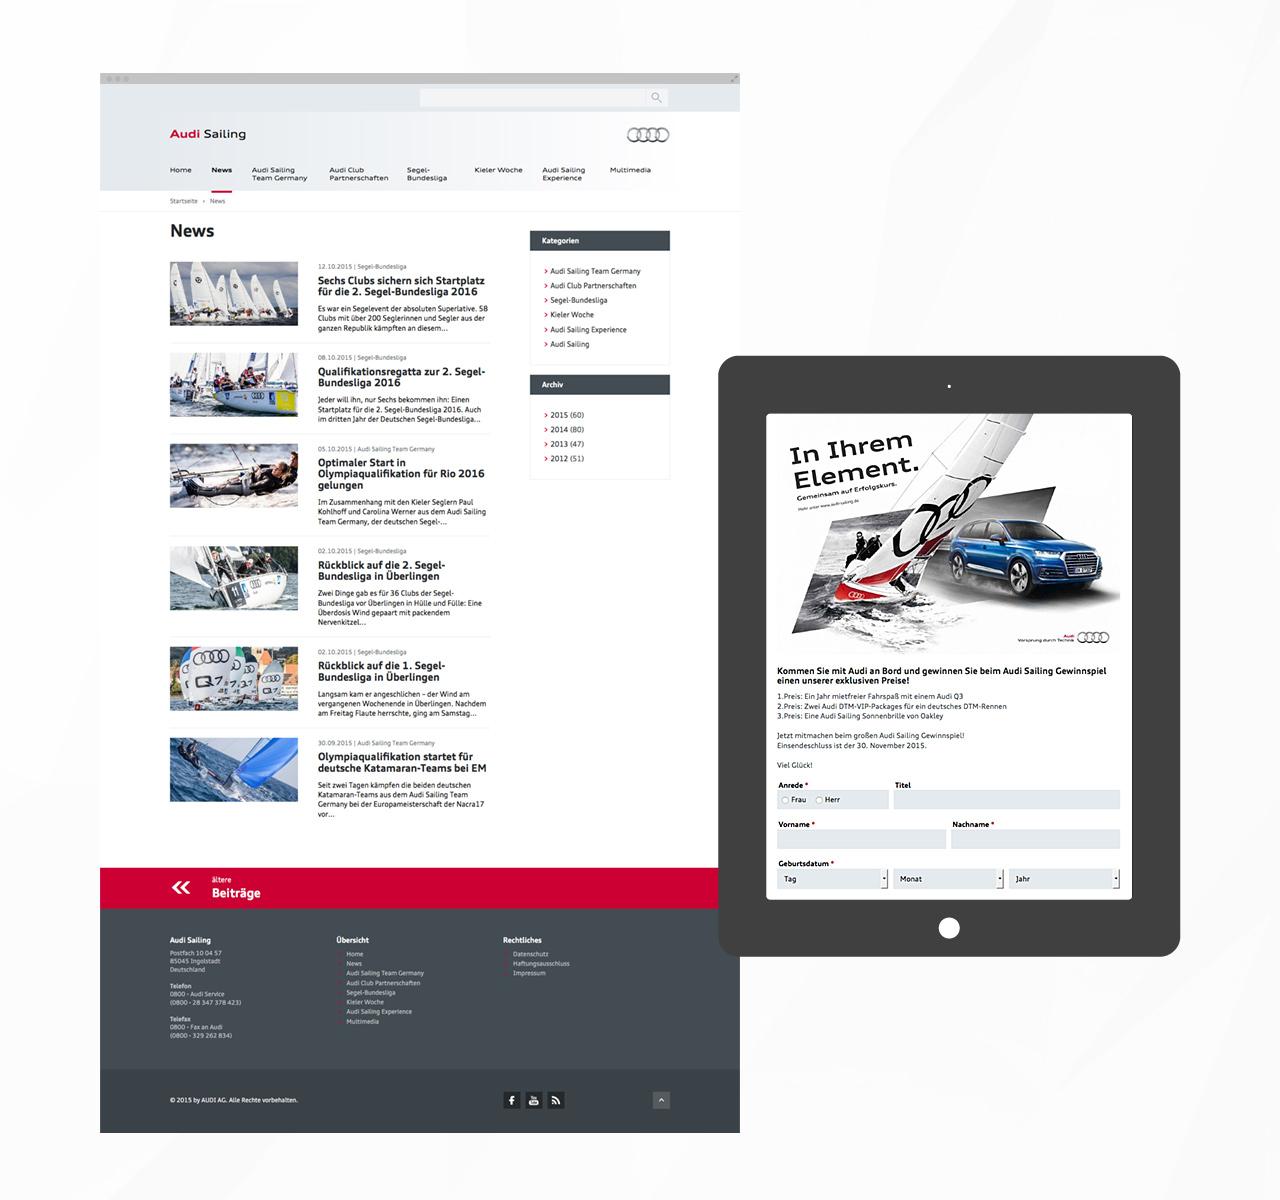 Audi Sailing - News | Gewinnspiel